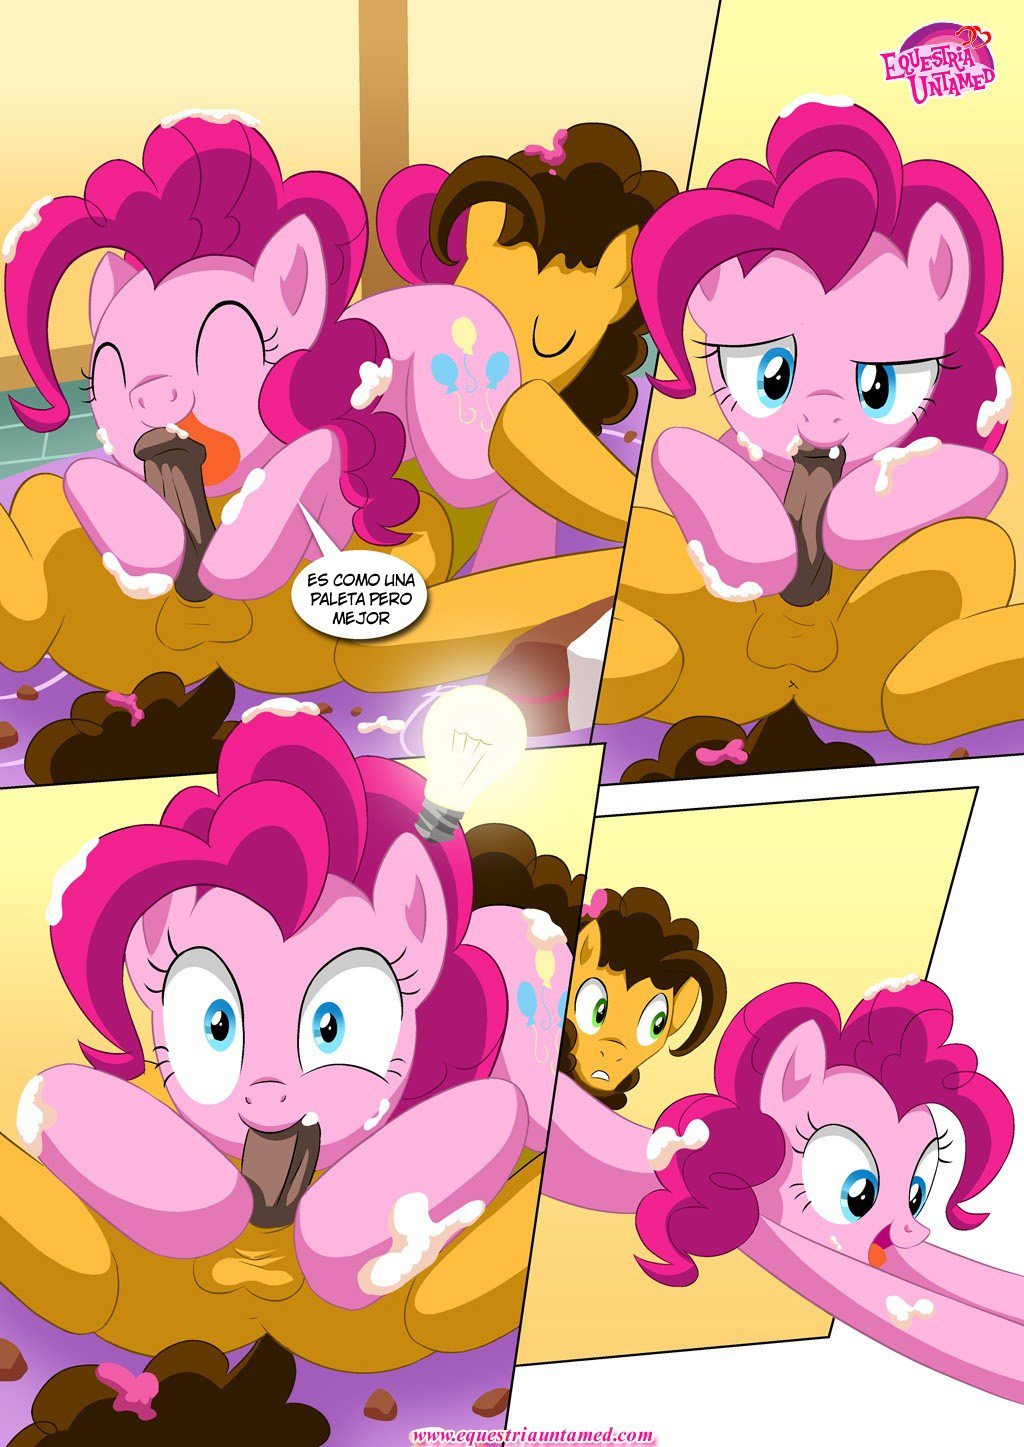 Sweet Treats [My little pony] [Palcomix]